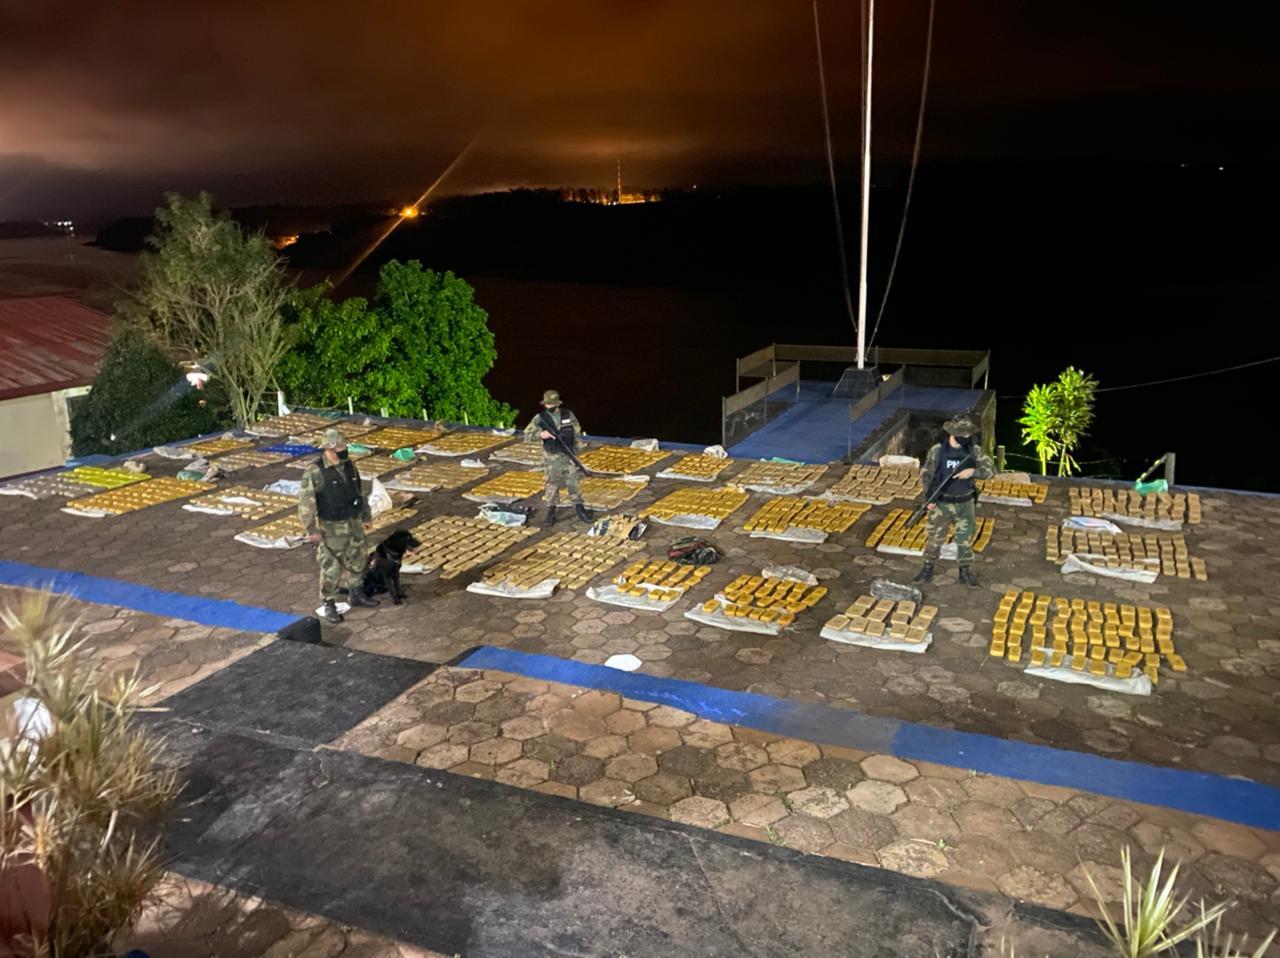 Argentina Seizes 8.7 Tons of Marijuana